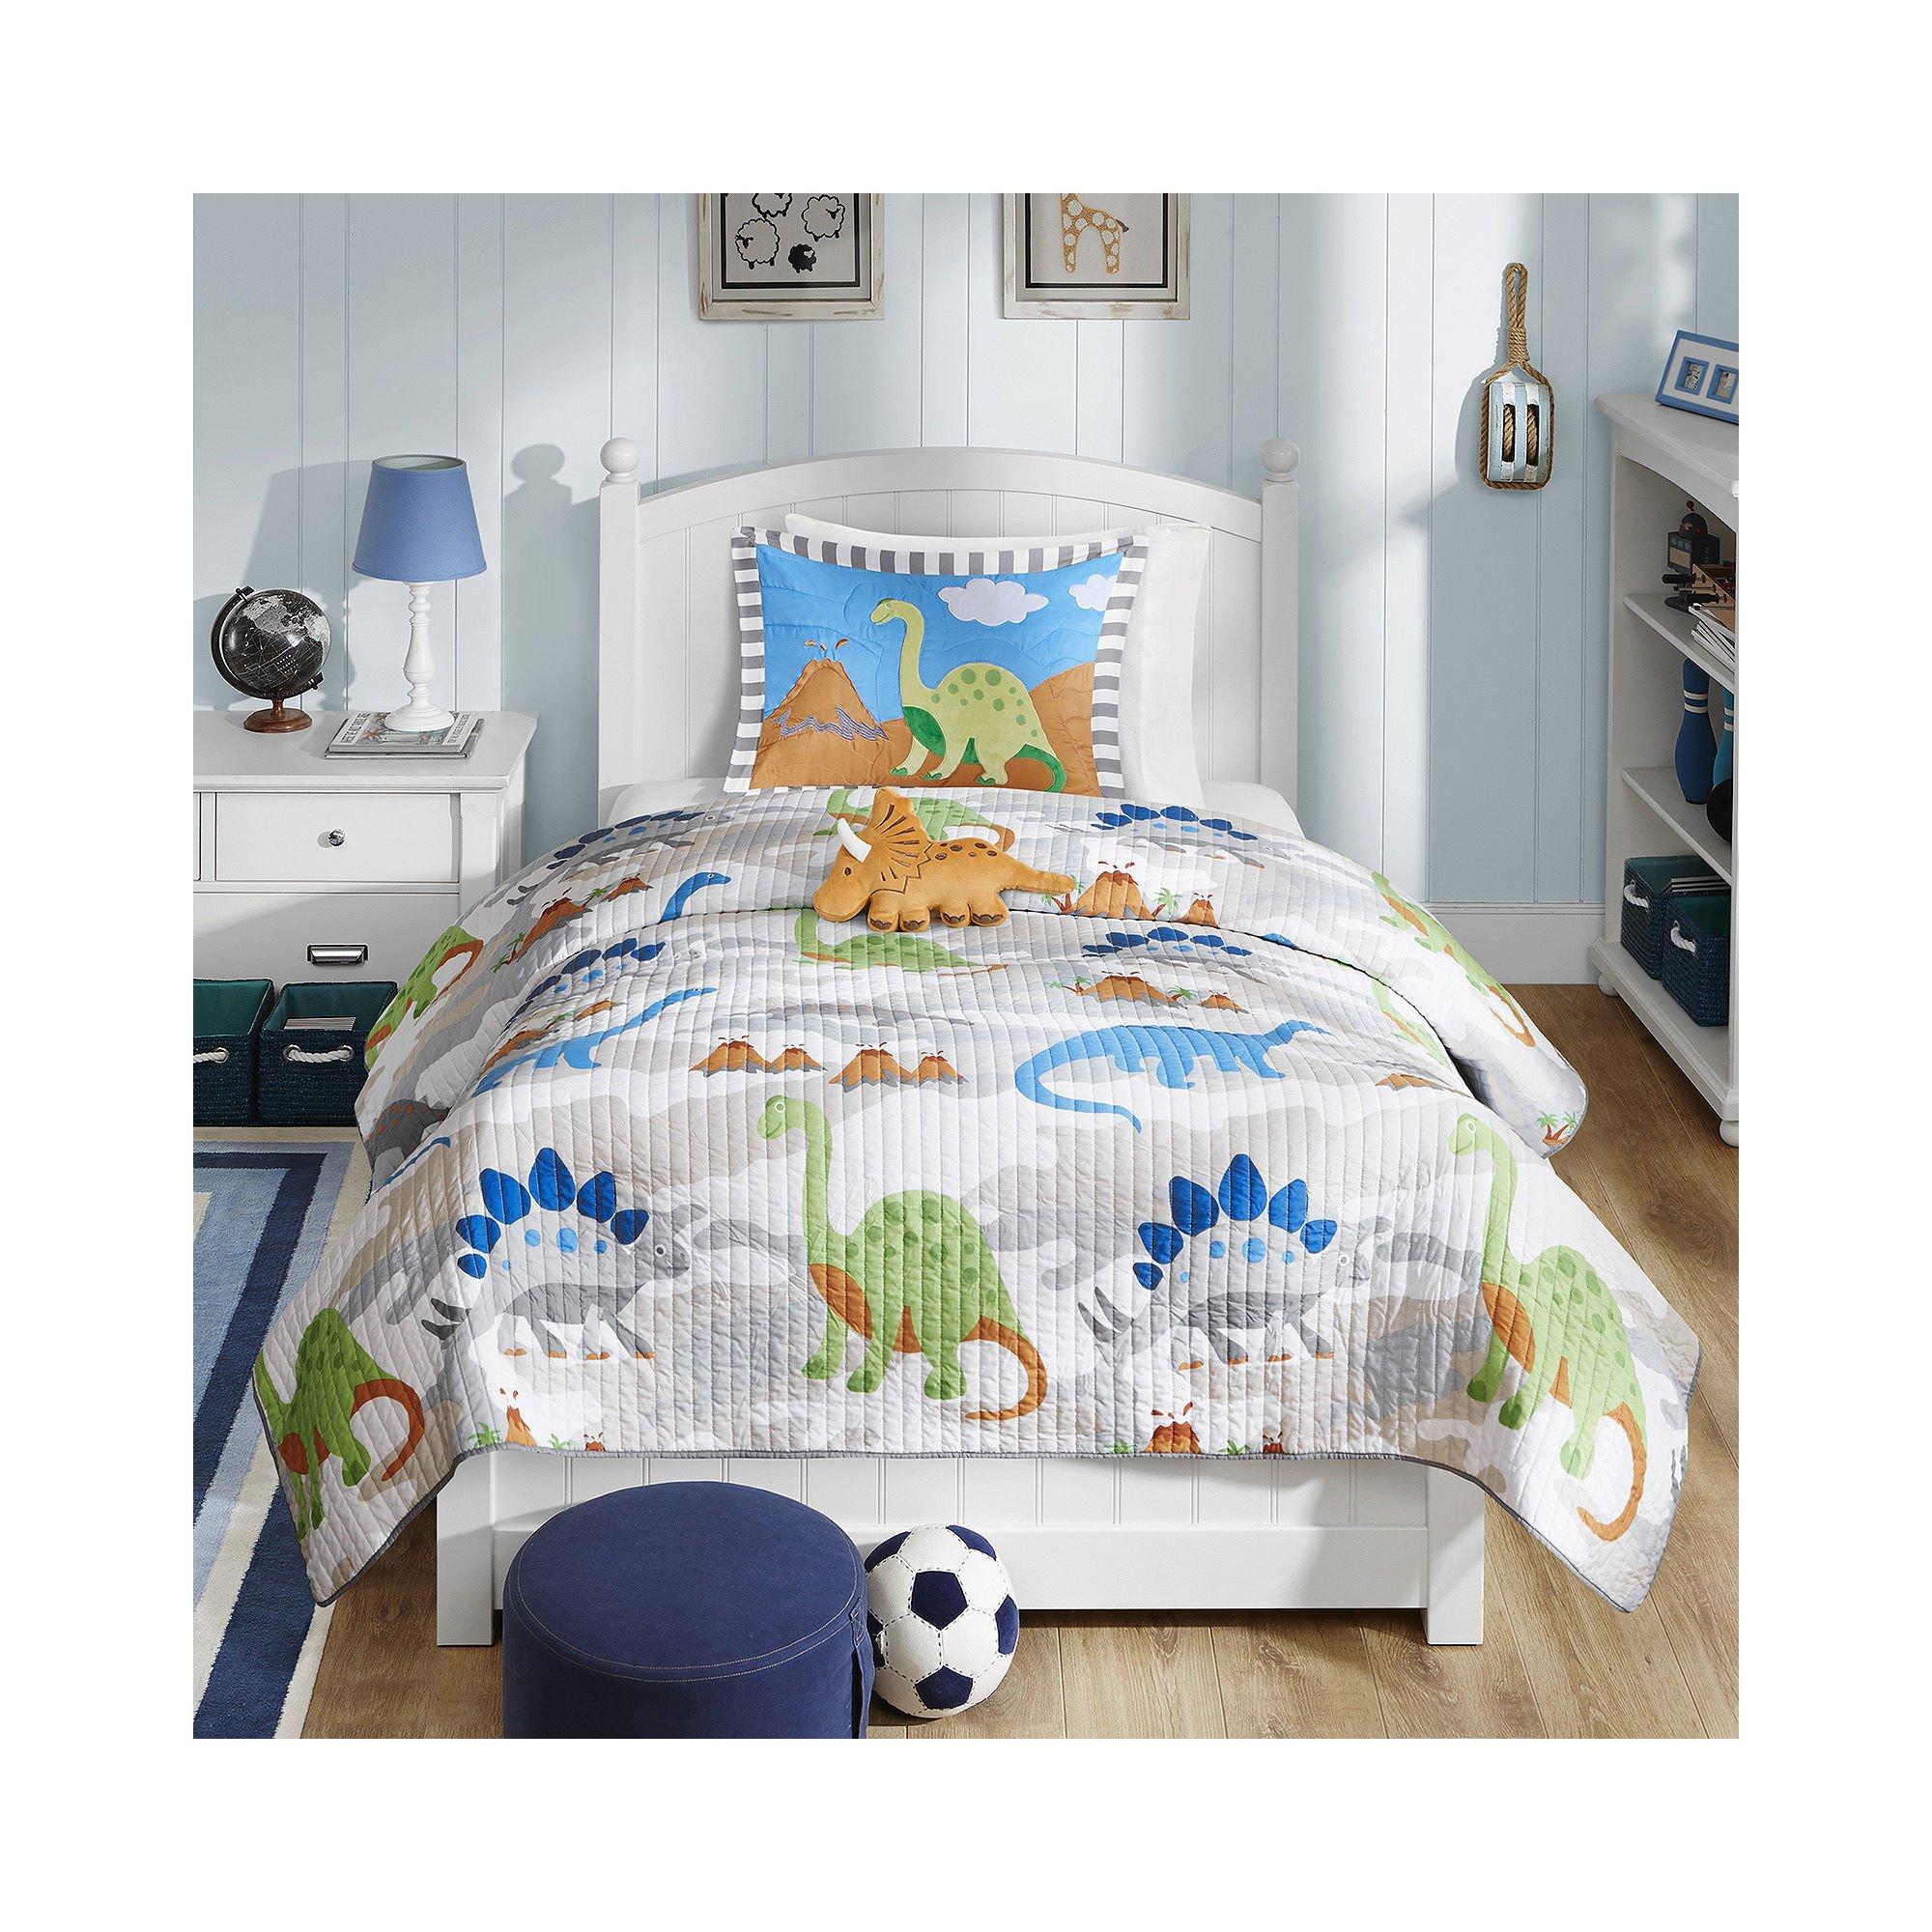 Mi-Zone Kids Little Foot Twin Bedding Sets Boys Quilt Set - Grey, Blue, Orange, Dinosaur – 3 Piece Kids Quilt for Boys – Cotton Filling Ultra Soft Microfiber Quilt Sets Coverlet by Mi-Zone (Image #1)